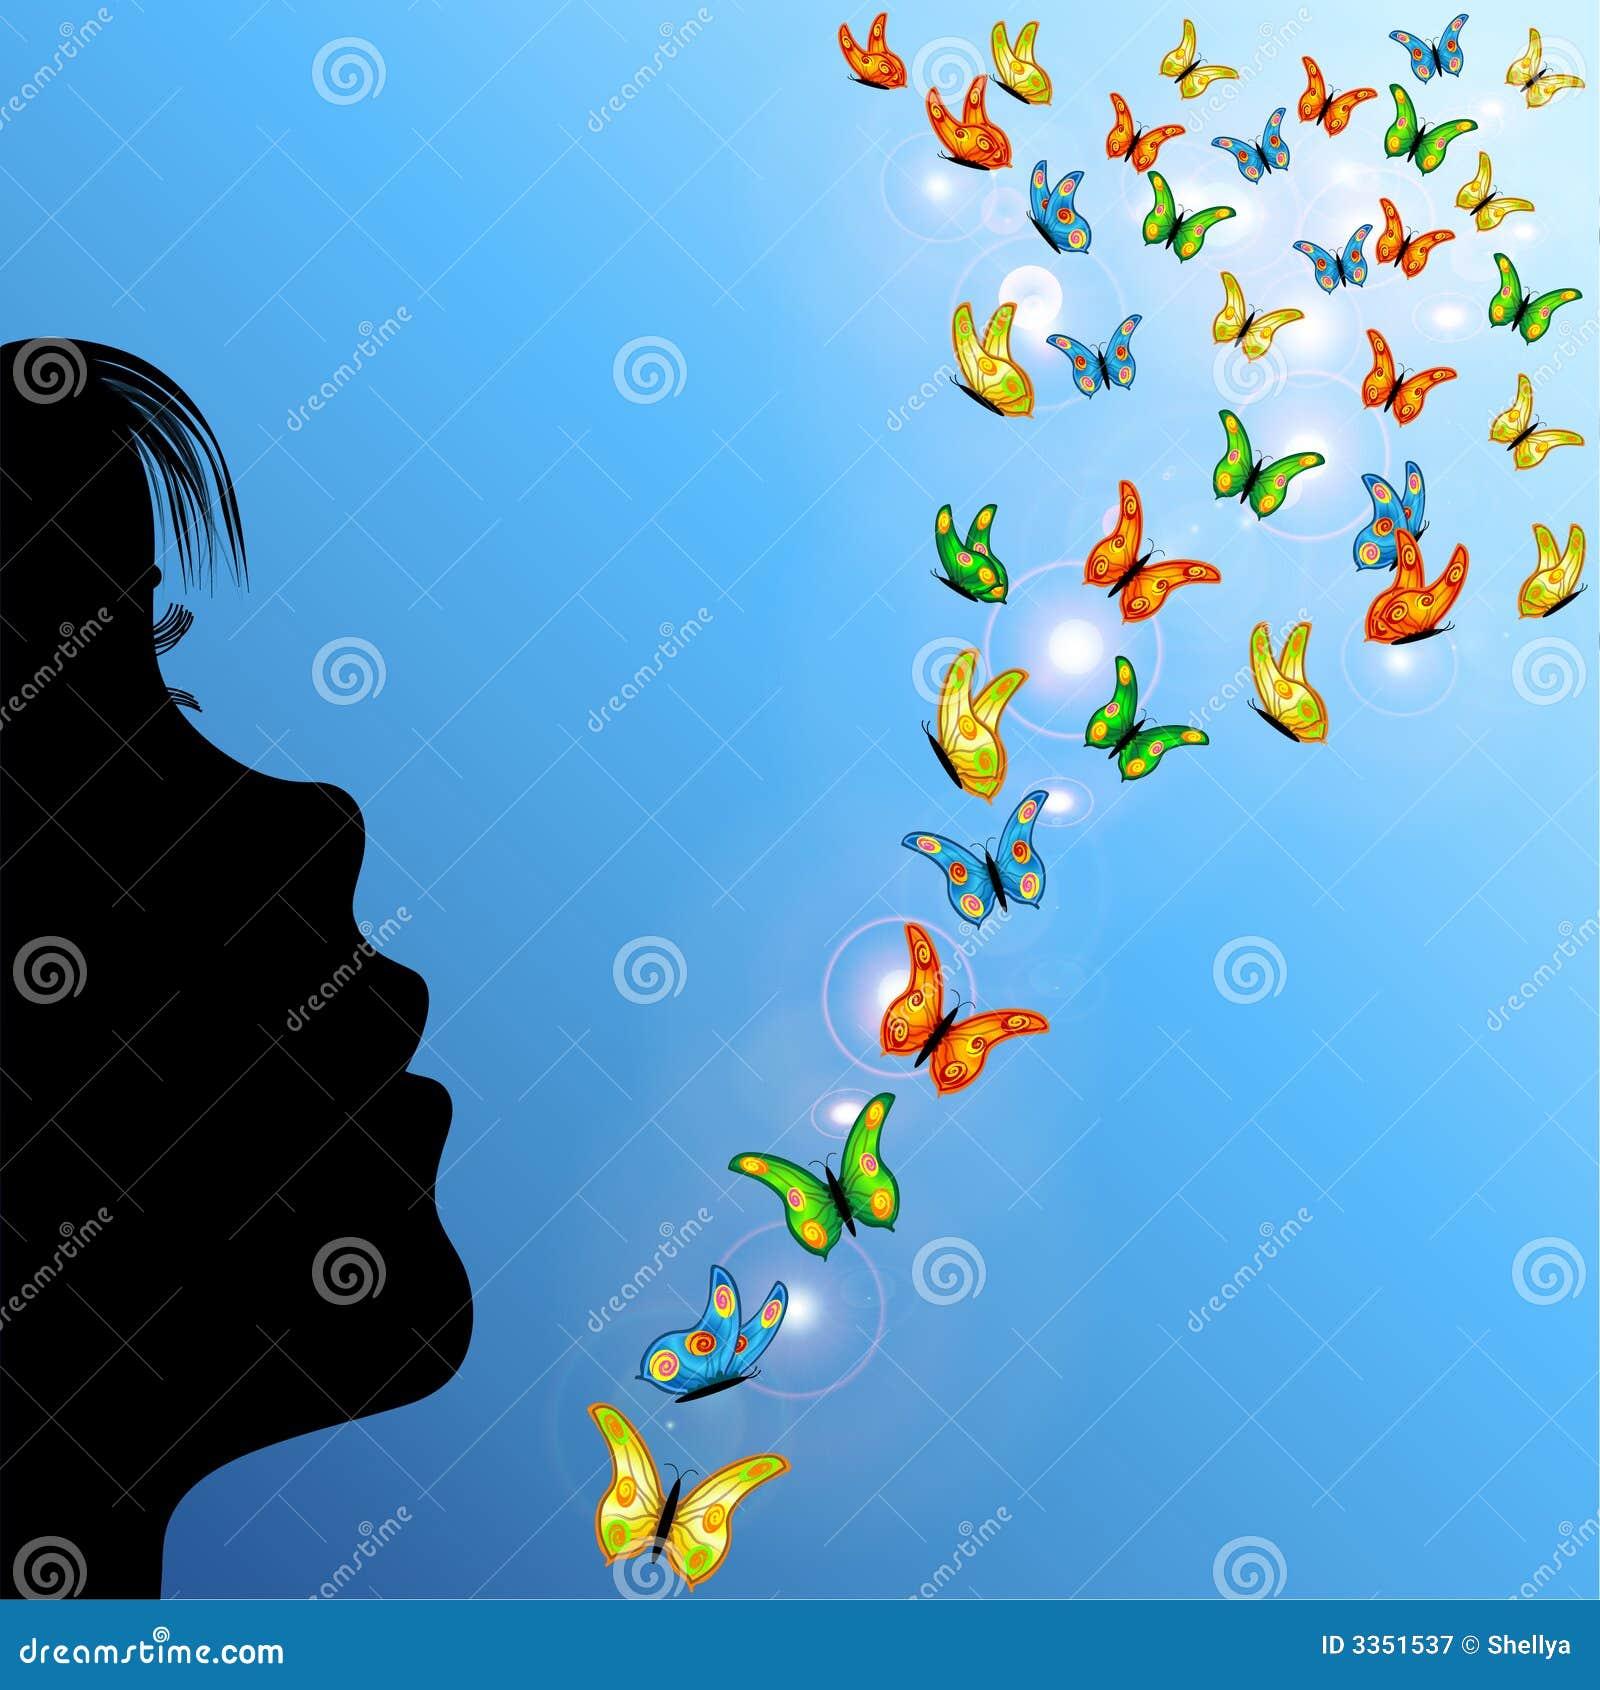 Menina e borboletas no céu